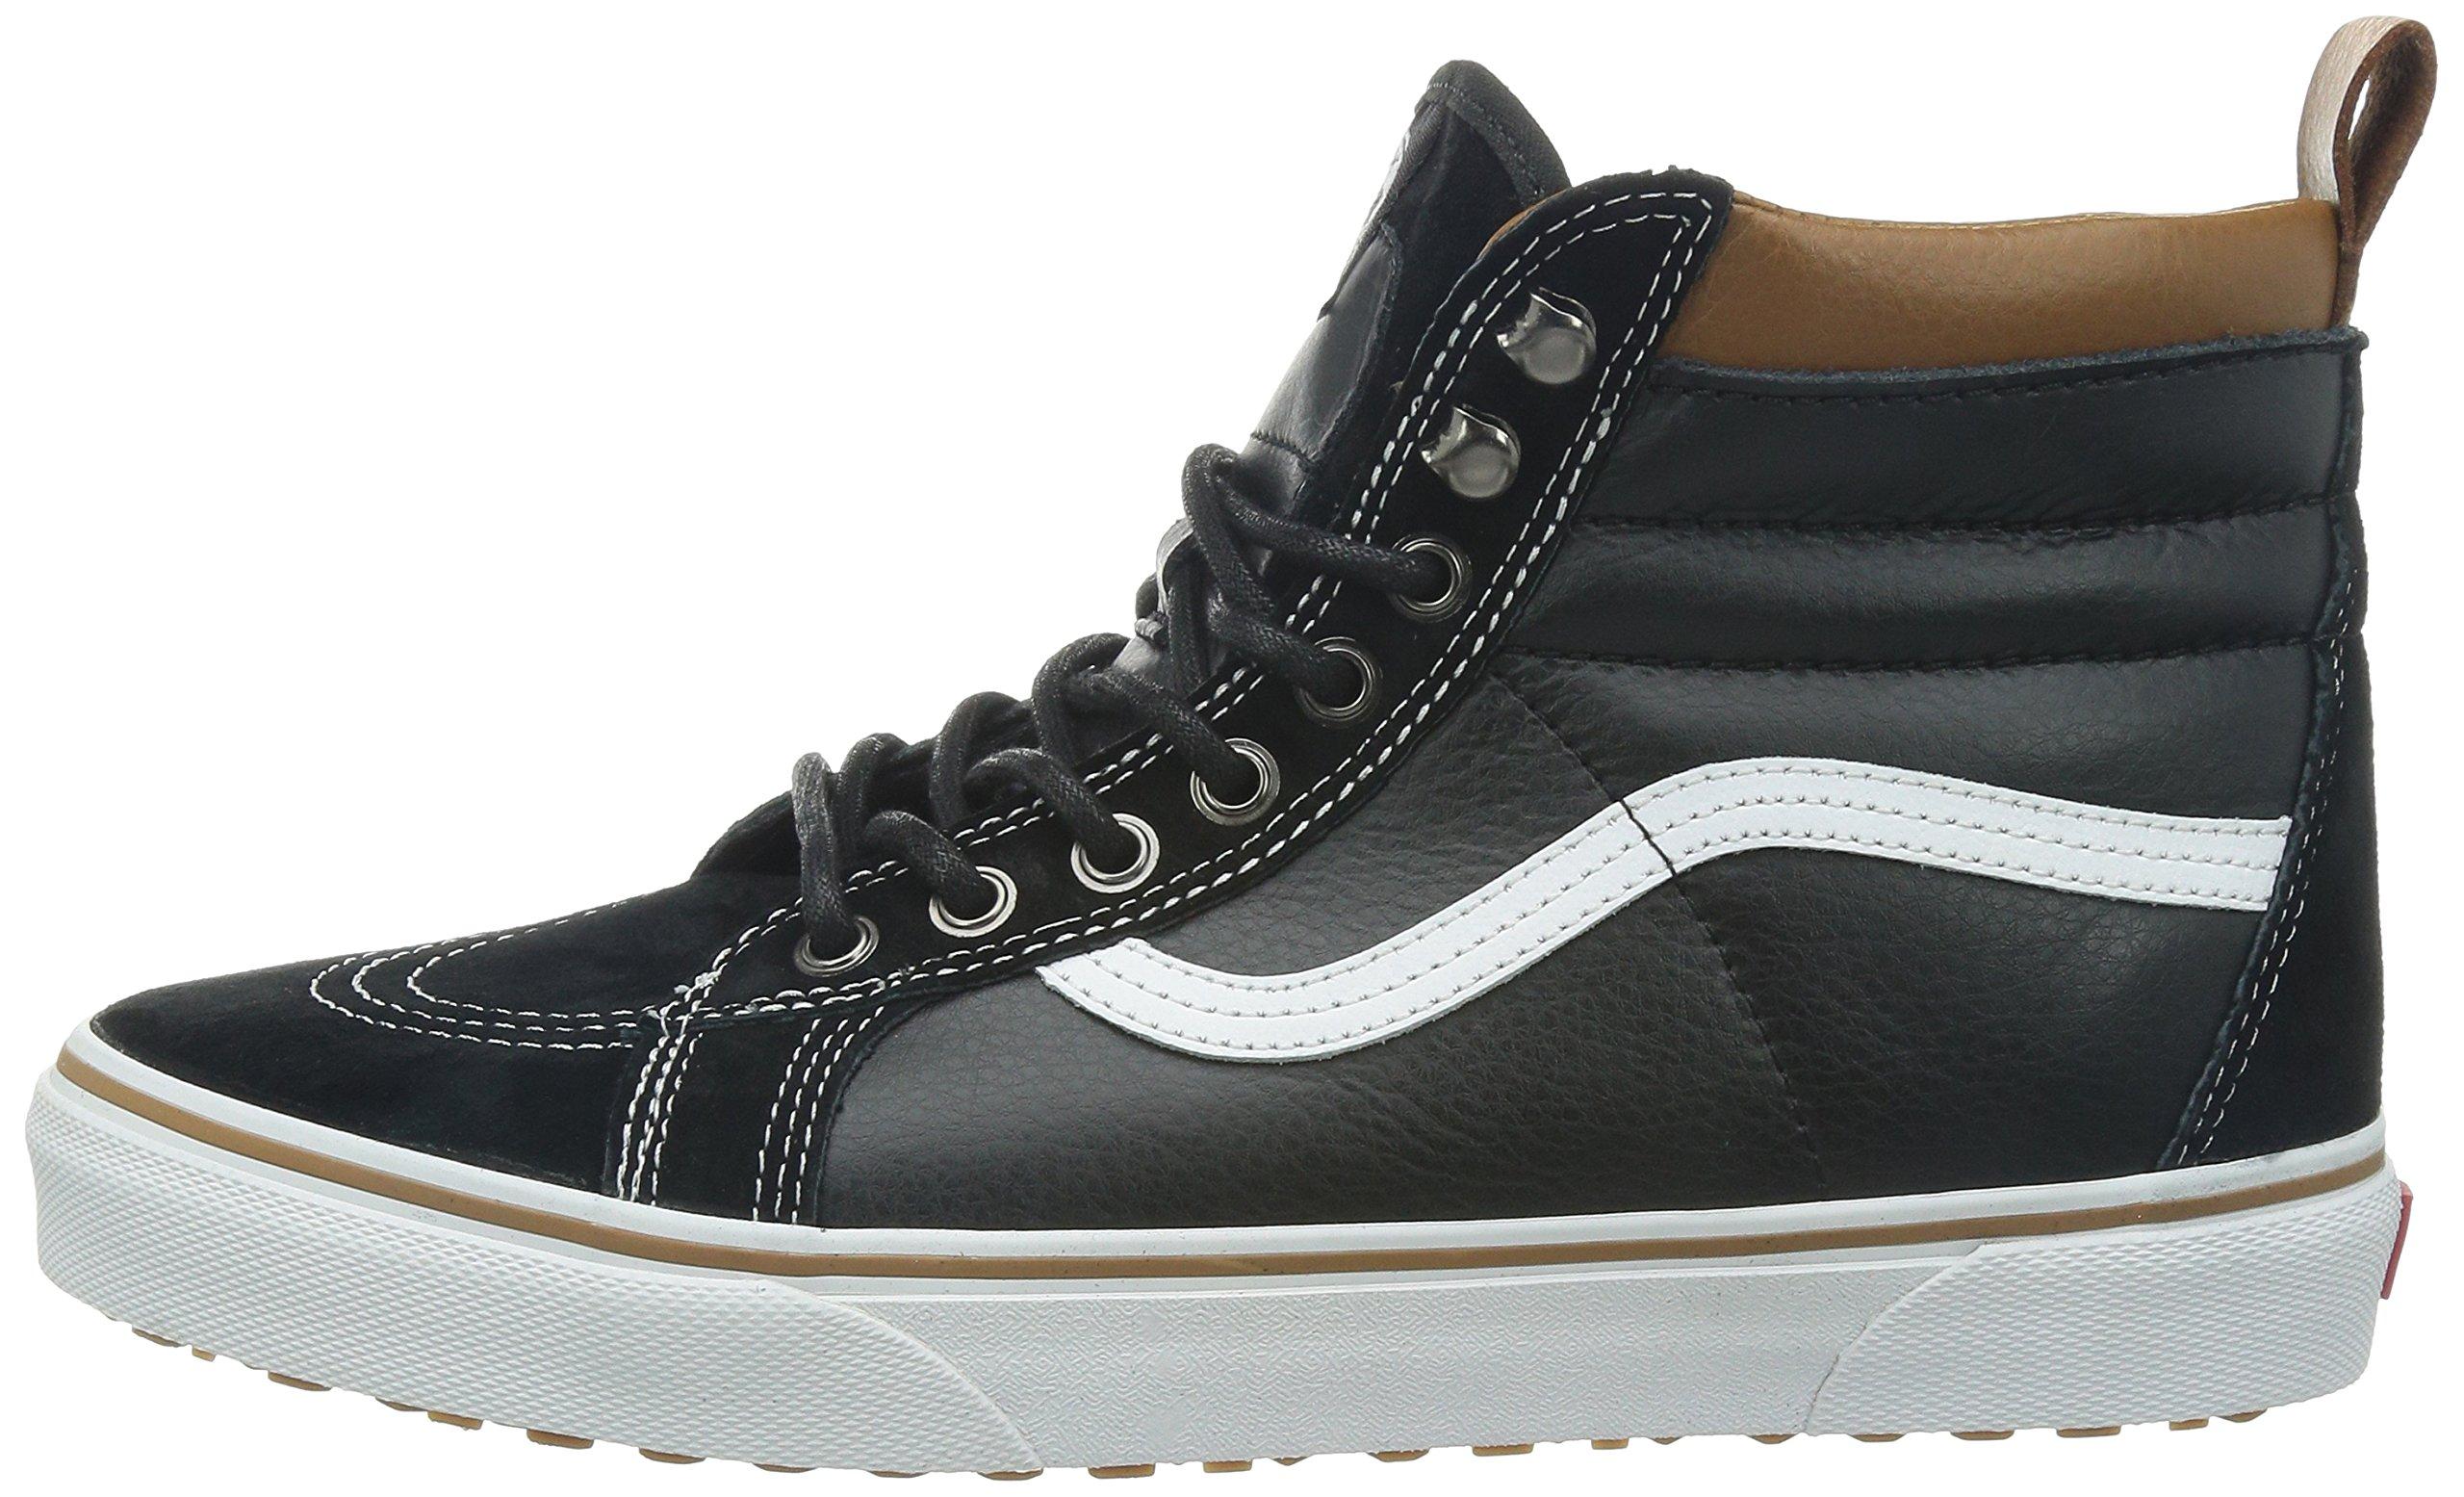 Vans Unisex Sk8-Hi MTE (MTE) Black/True White Skate Shoe 8.5 Men US/10 Women US by Vans (Image #5)